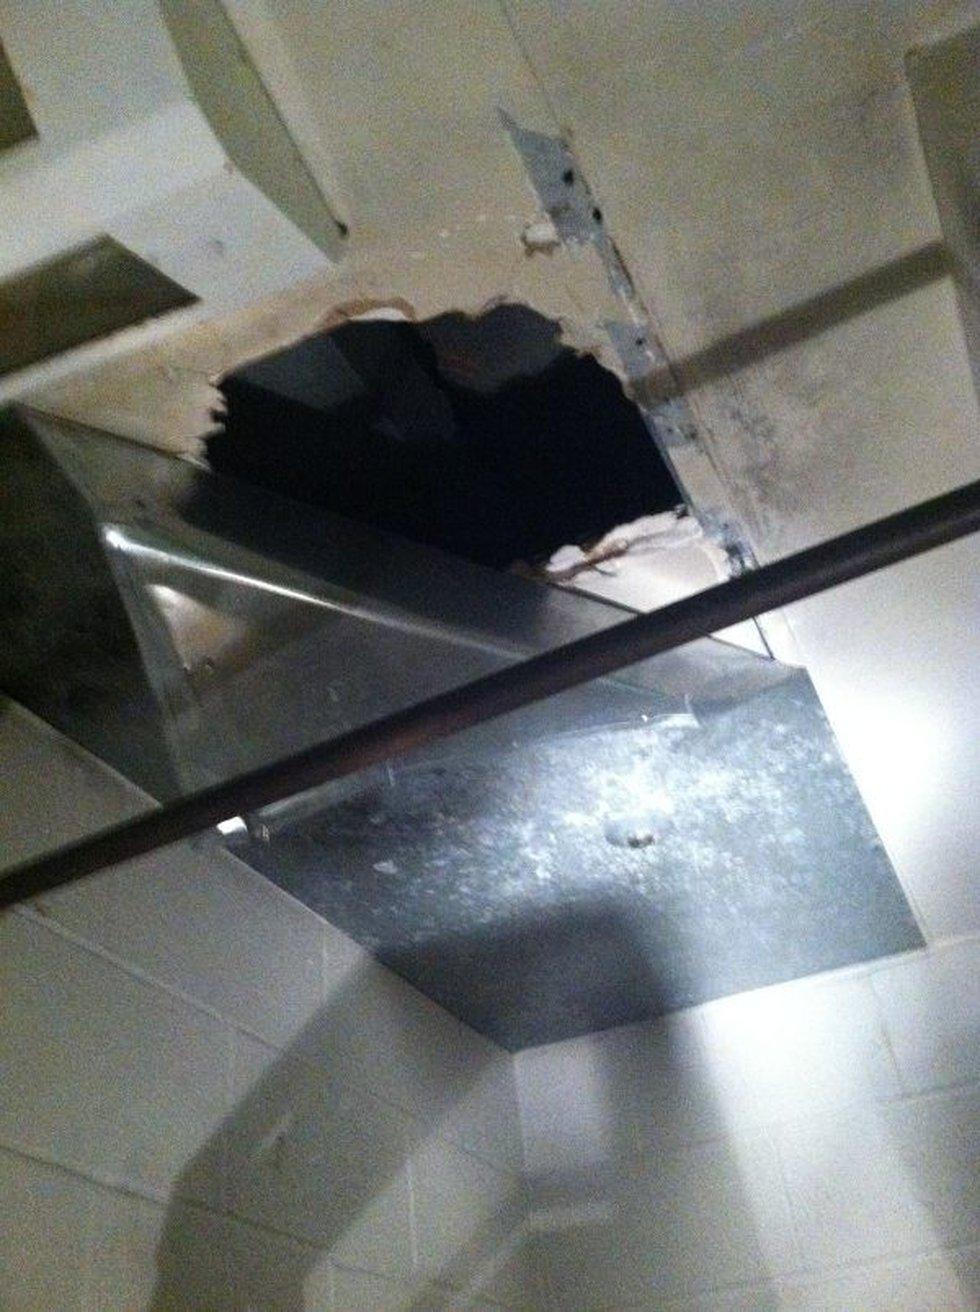 This inmates escaped through this hole in their jail pod. (Source: Todd Tumminia, KFVS)